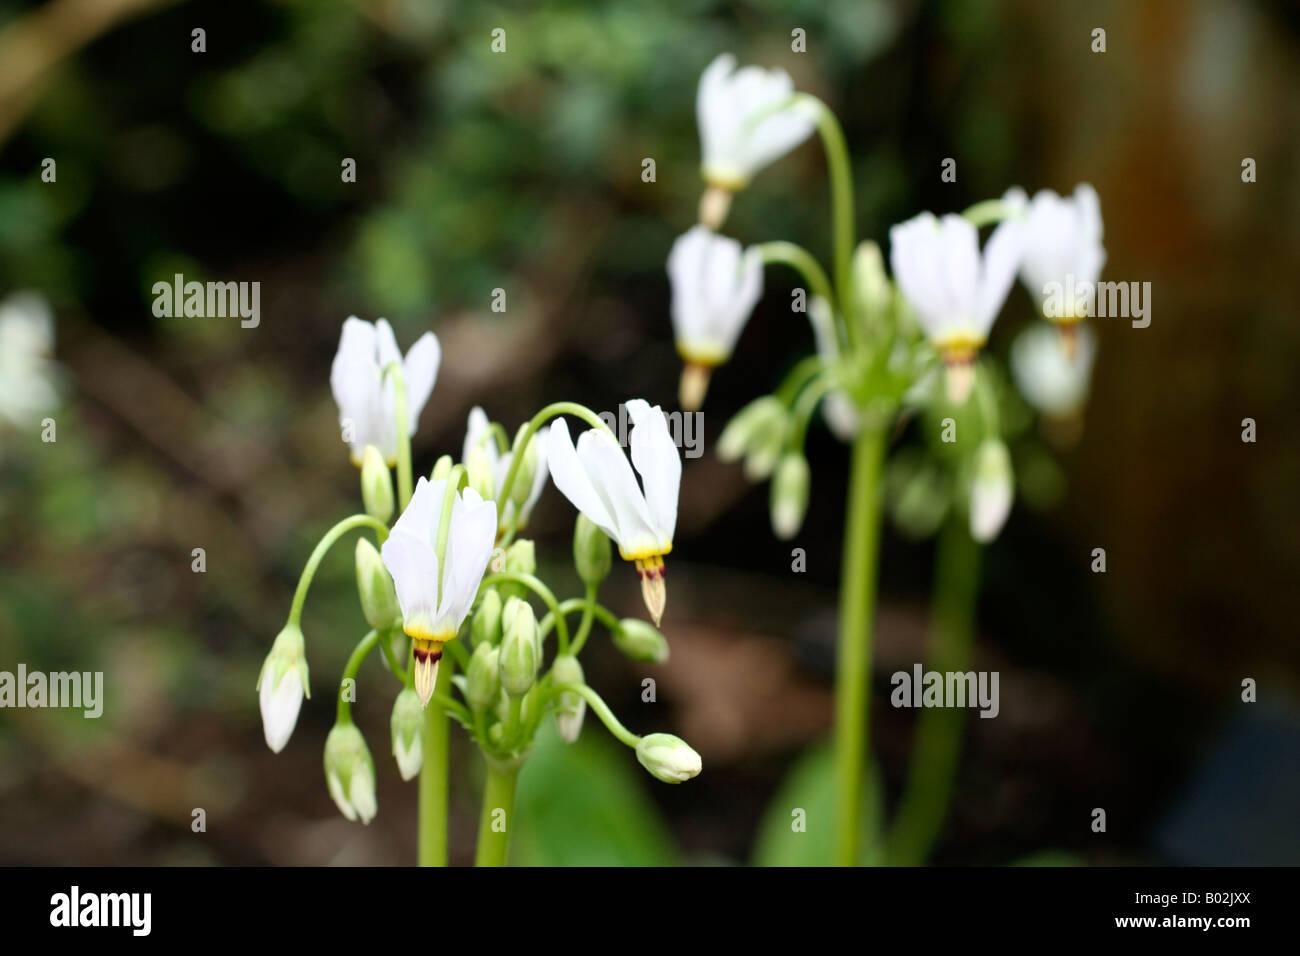 DODECATHEON MEADIA ALBUM AGM - Stock Image